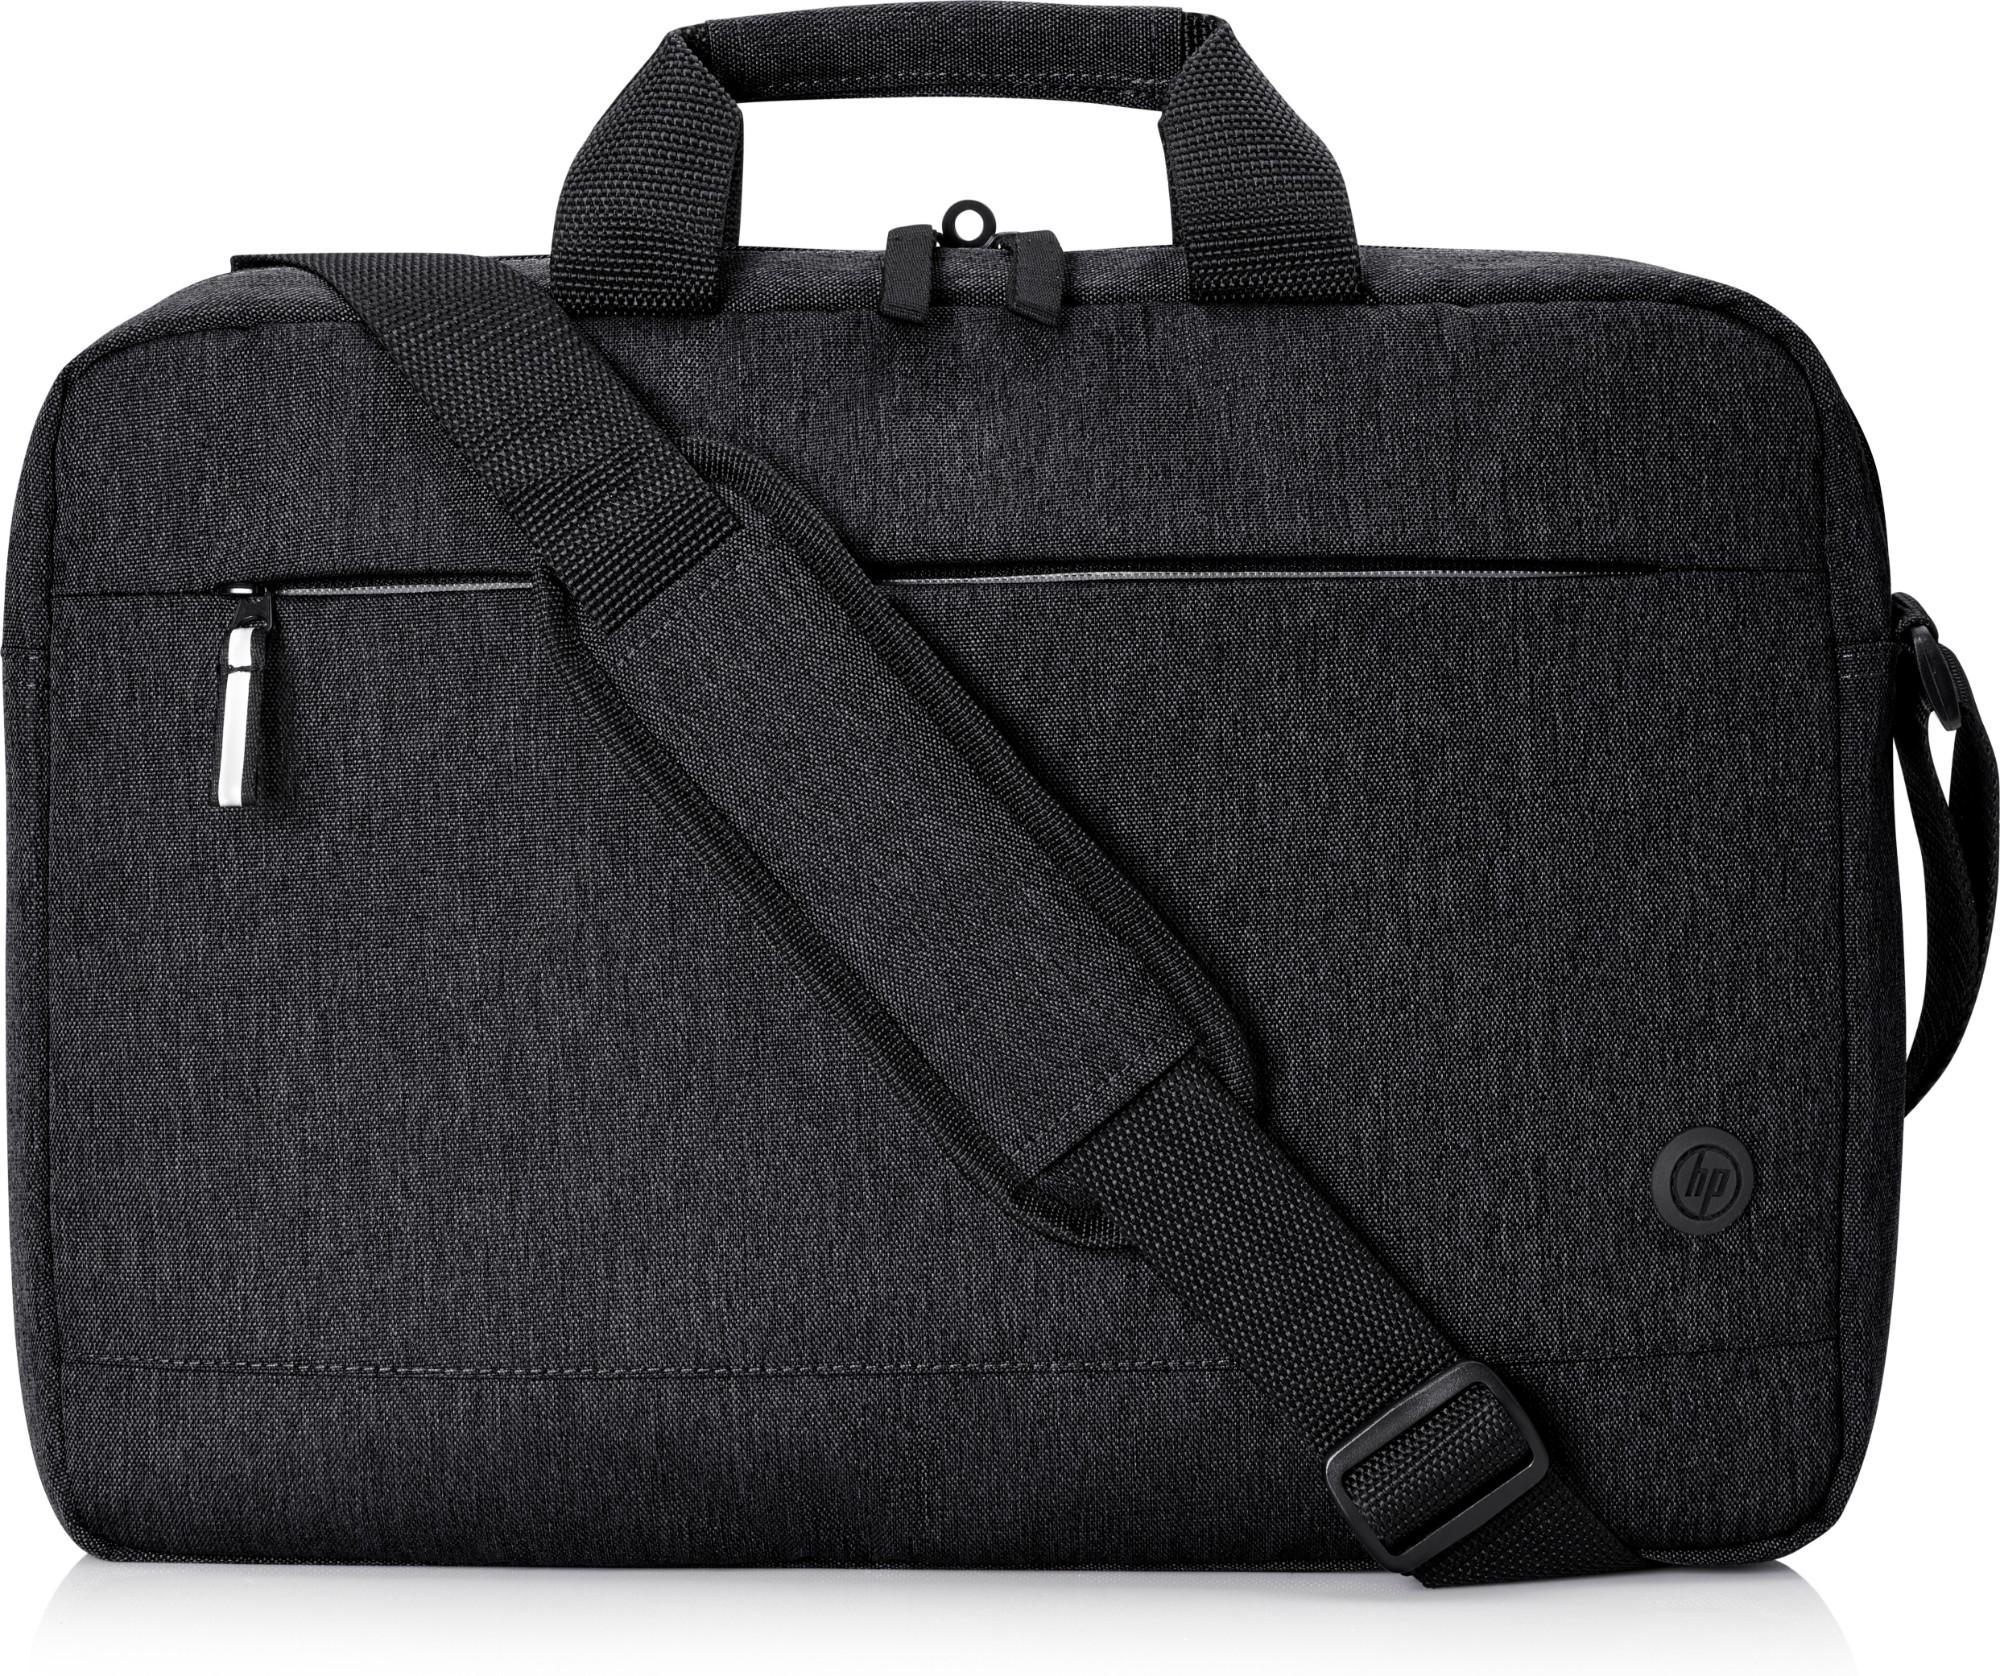 HP 1X645AA notebook case 39.6 cm (15.6